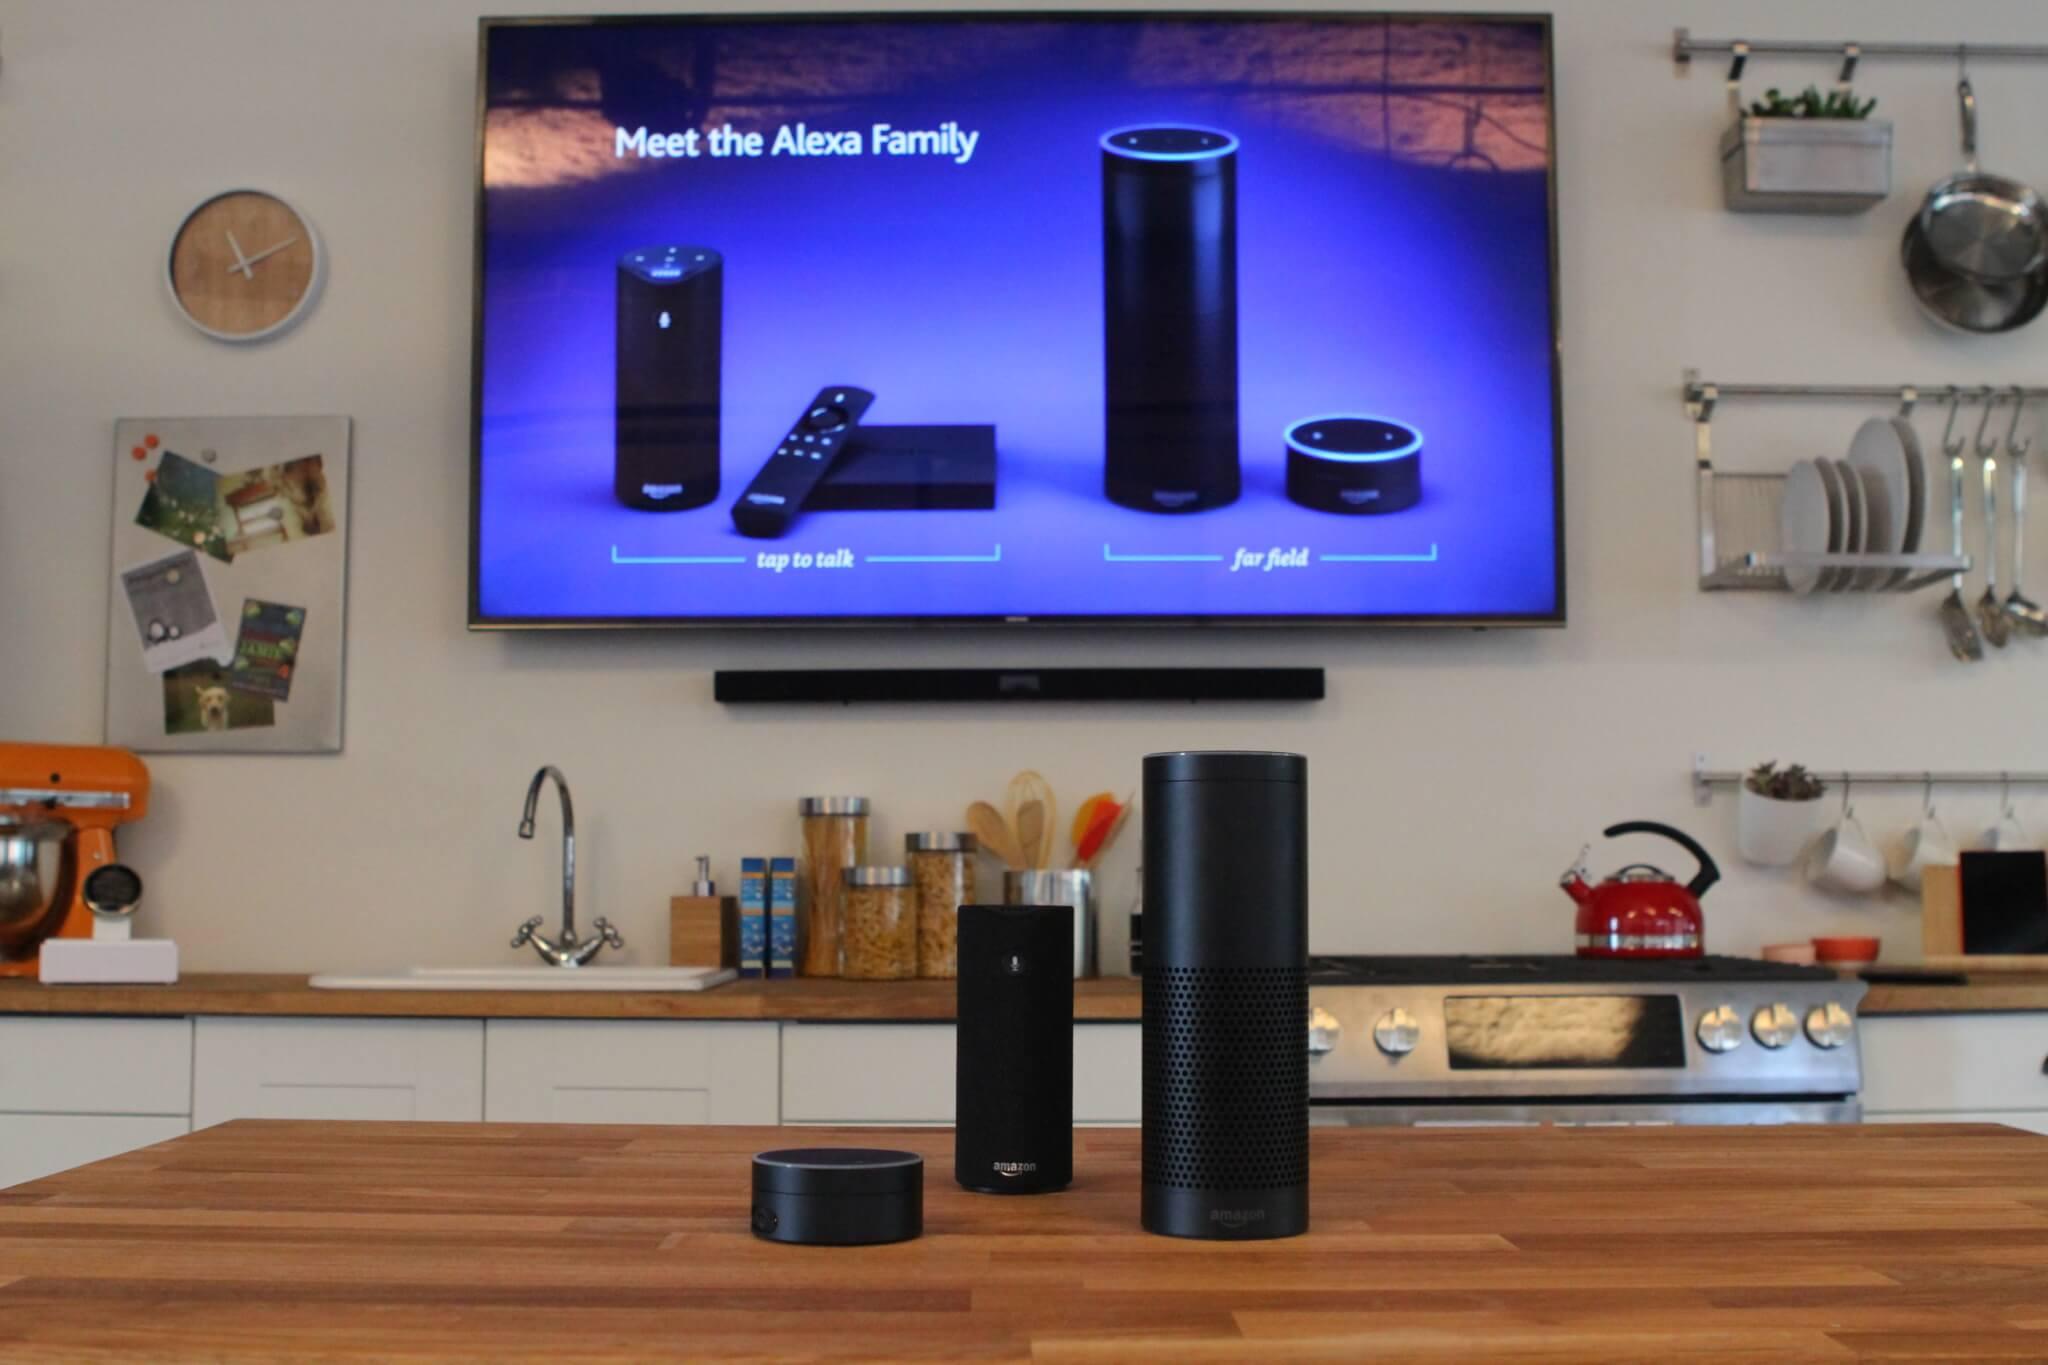 Amazon's family of Alexa-enabled devices